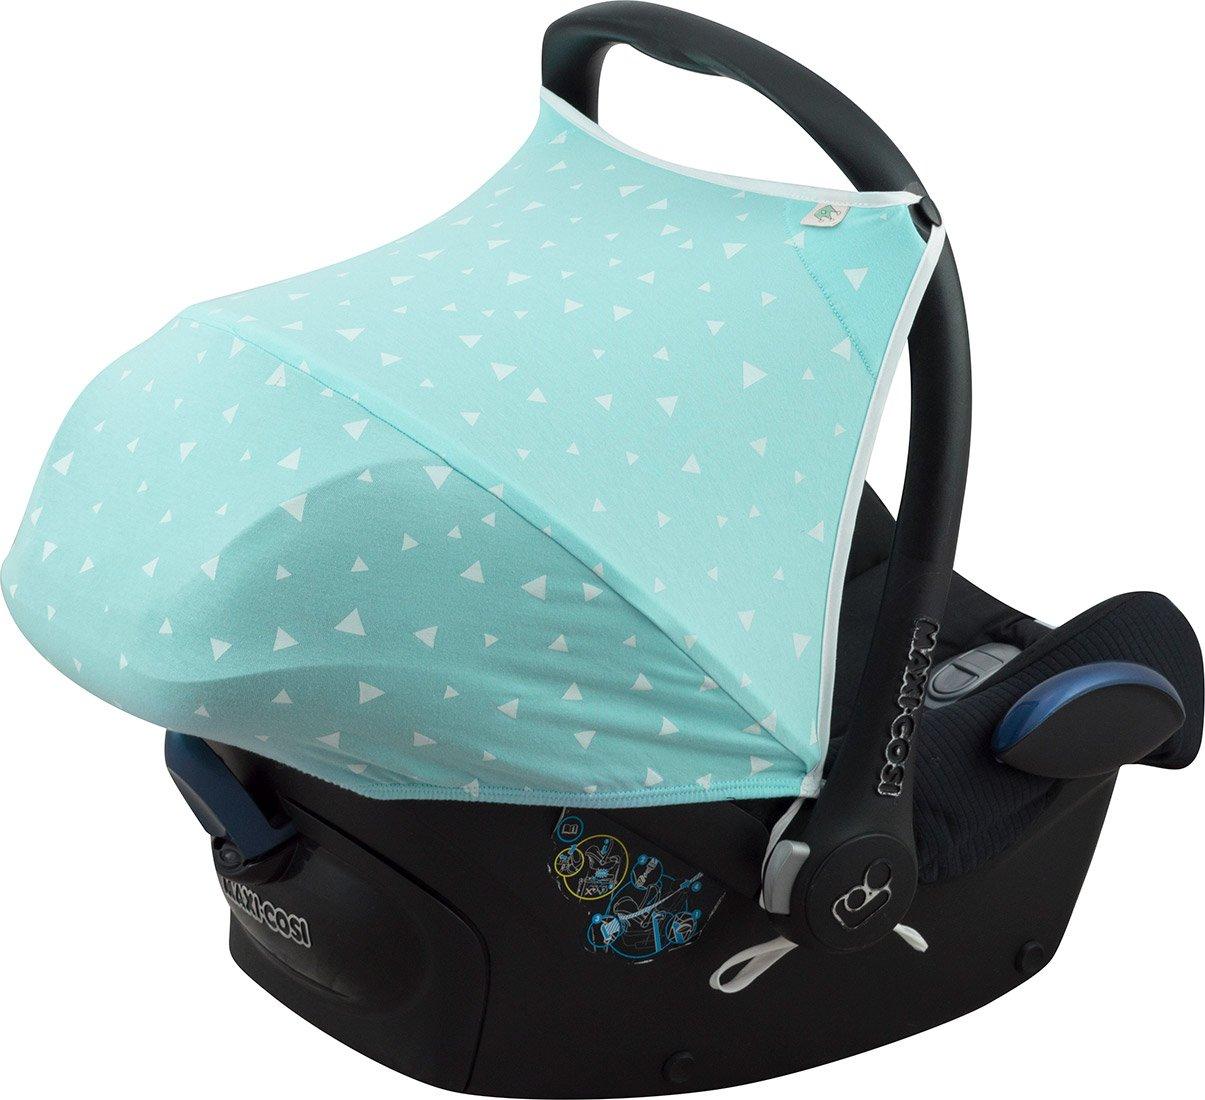 Finerolls 5PCS Multifunctional Waterproof Mummy Bag Microfiber Baby Nappy Changing Bags Set Diaper Hospital Bag Blue